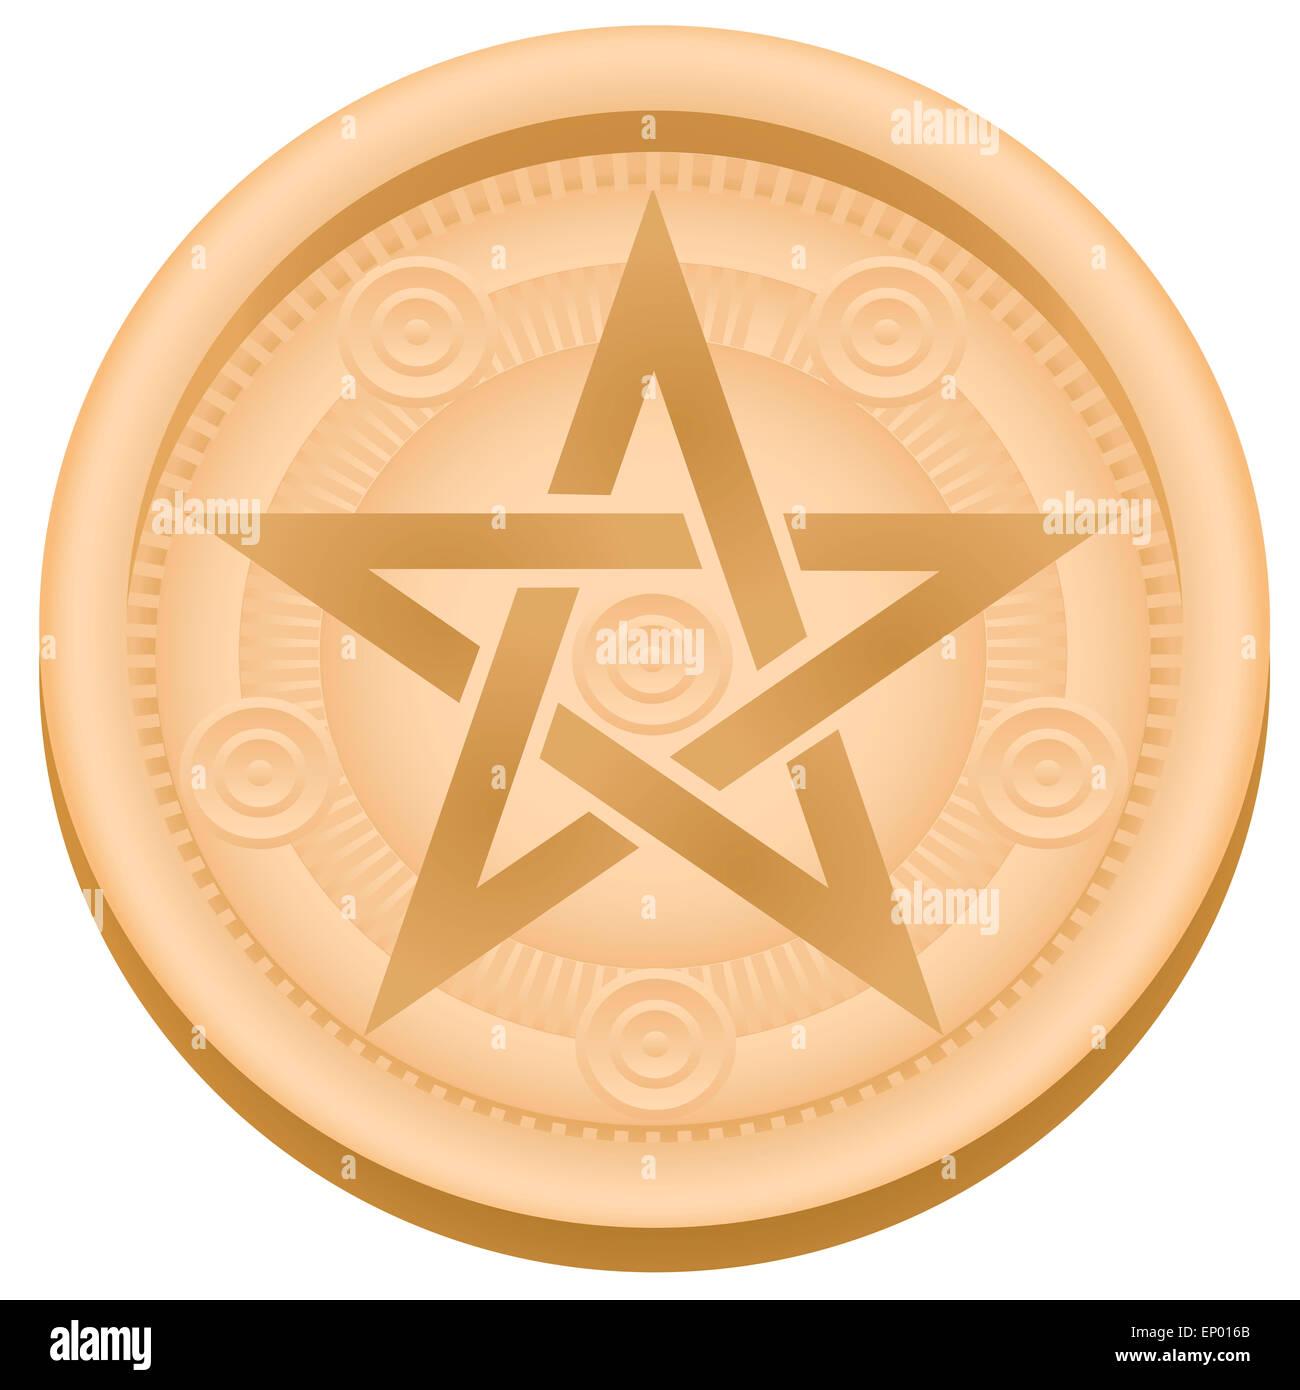 Pentagram symbol stock photos pentagram symbol stock images alamy pentacle an esoteric pentagram symbol illustration on white background stock image biocorpaavc Images